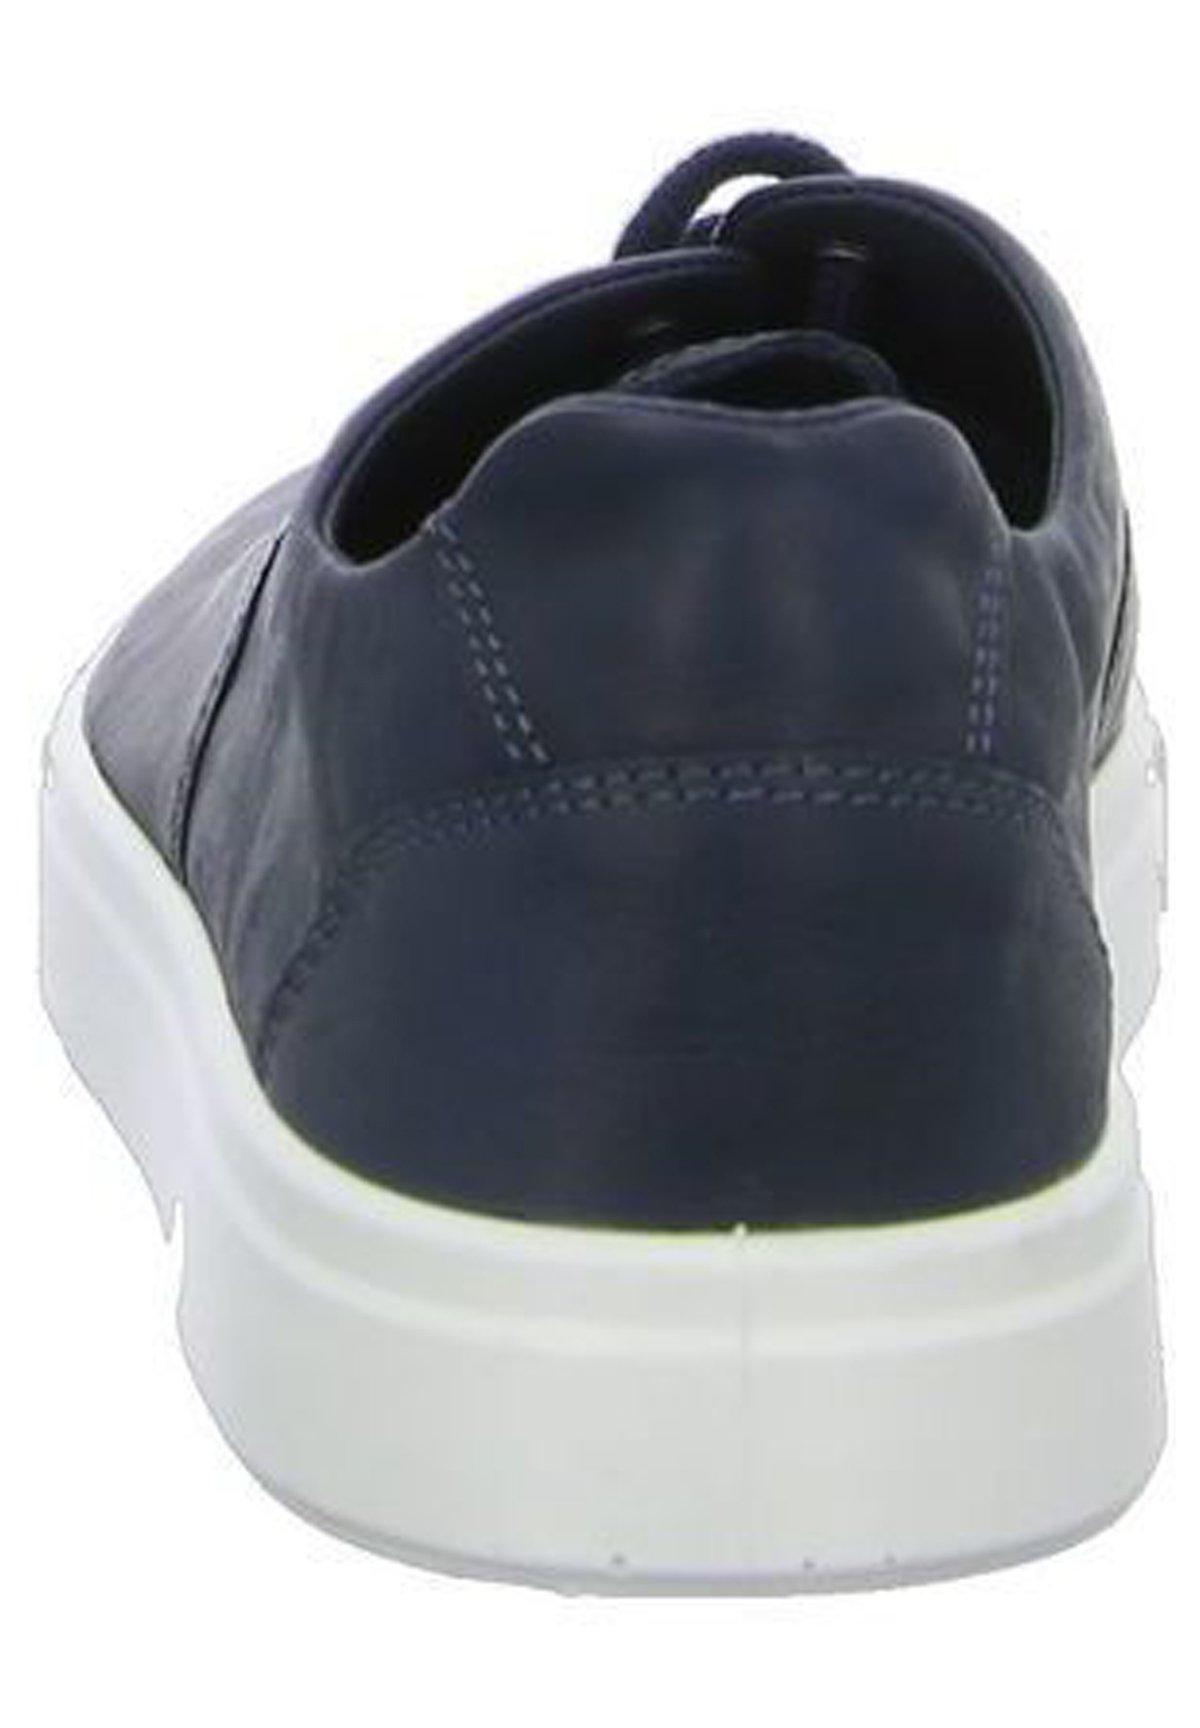 ECCO Sneaker low - marine/blau - Herrenschuhe 8aP36